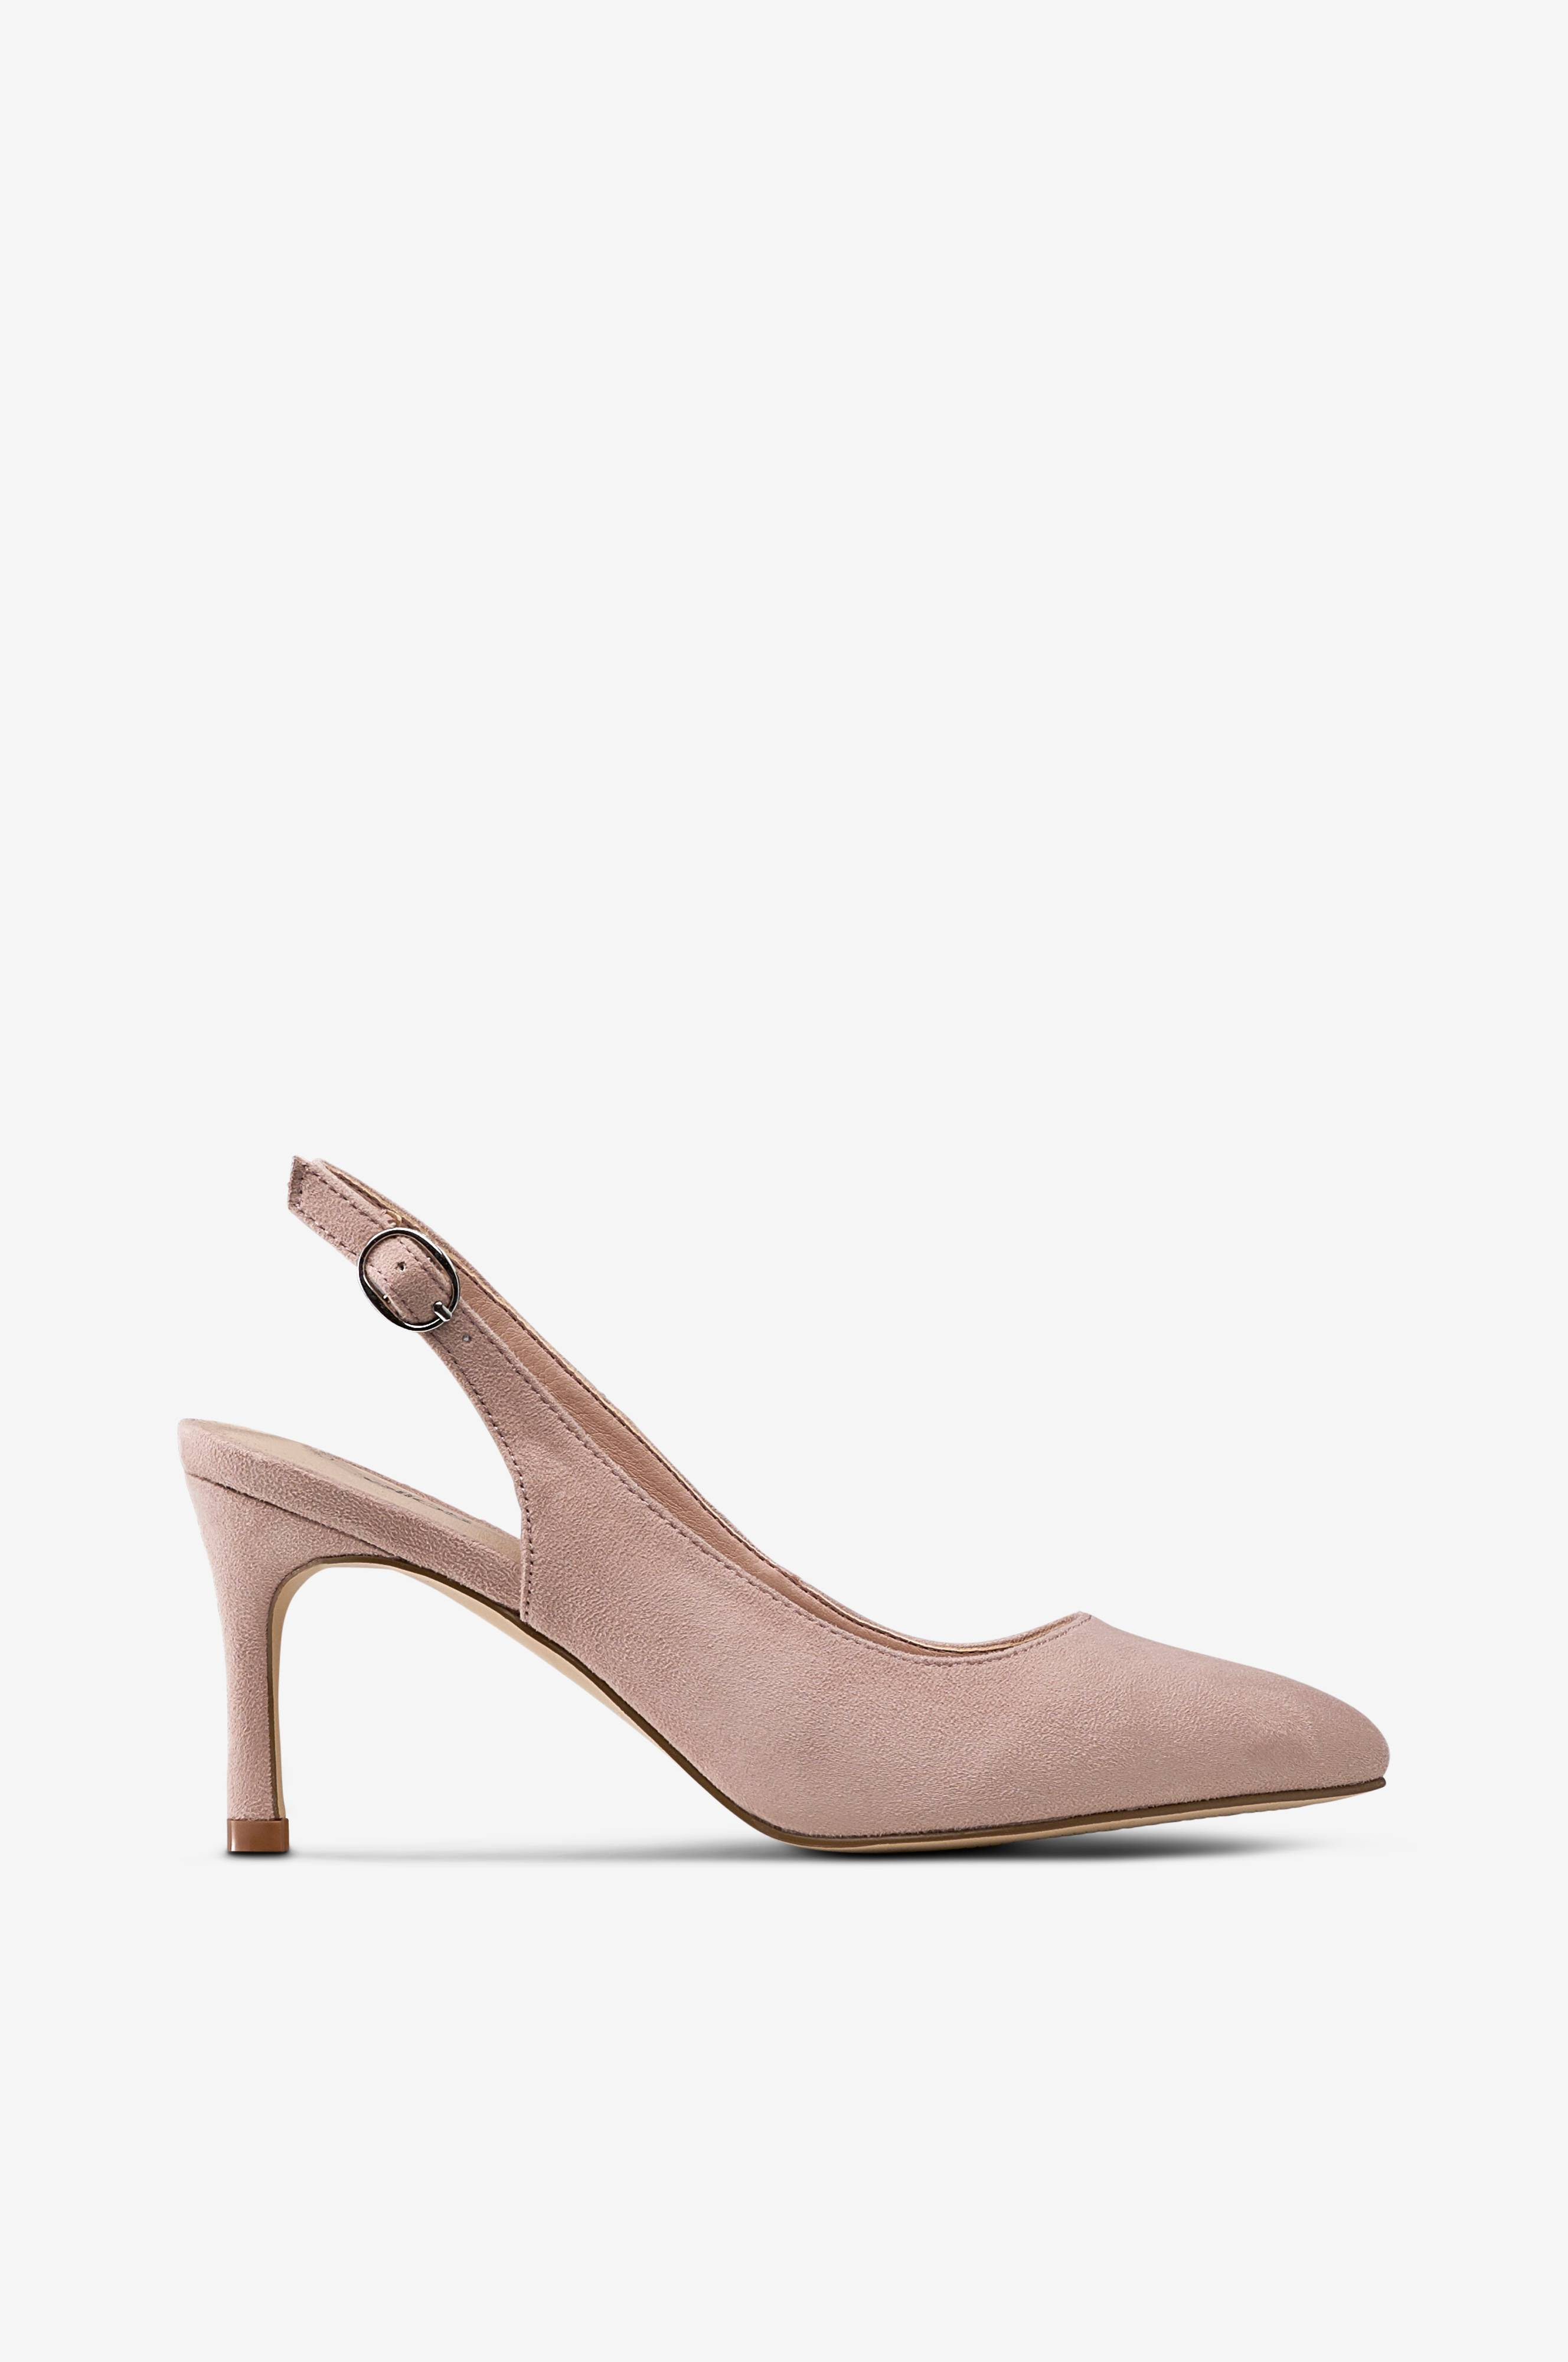 Ellos Shoes Wichita Slingback -avokkaat - Roosa - Naiset - Ellos.fi 6c74753edc